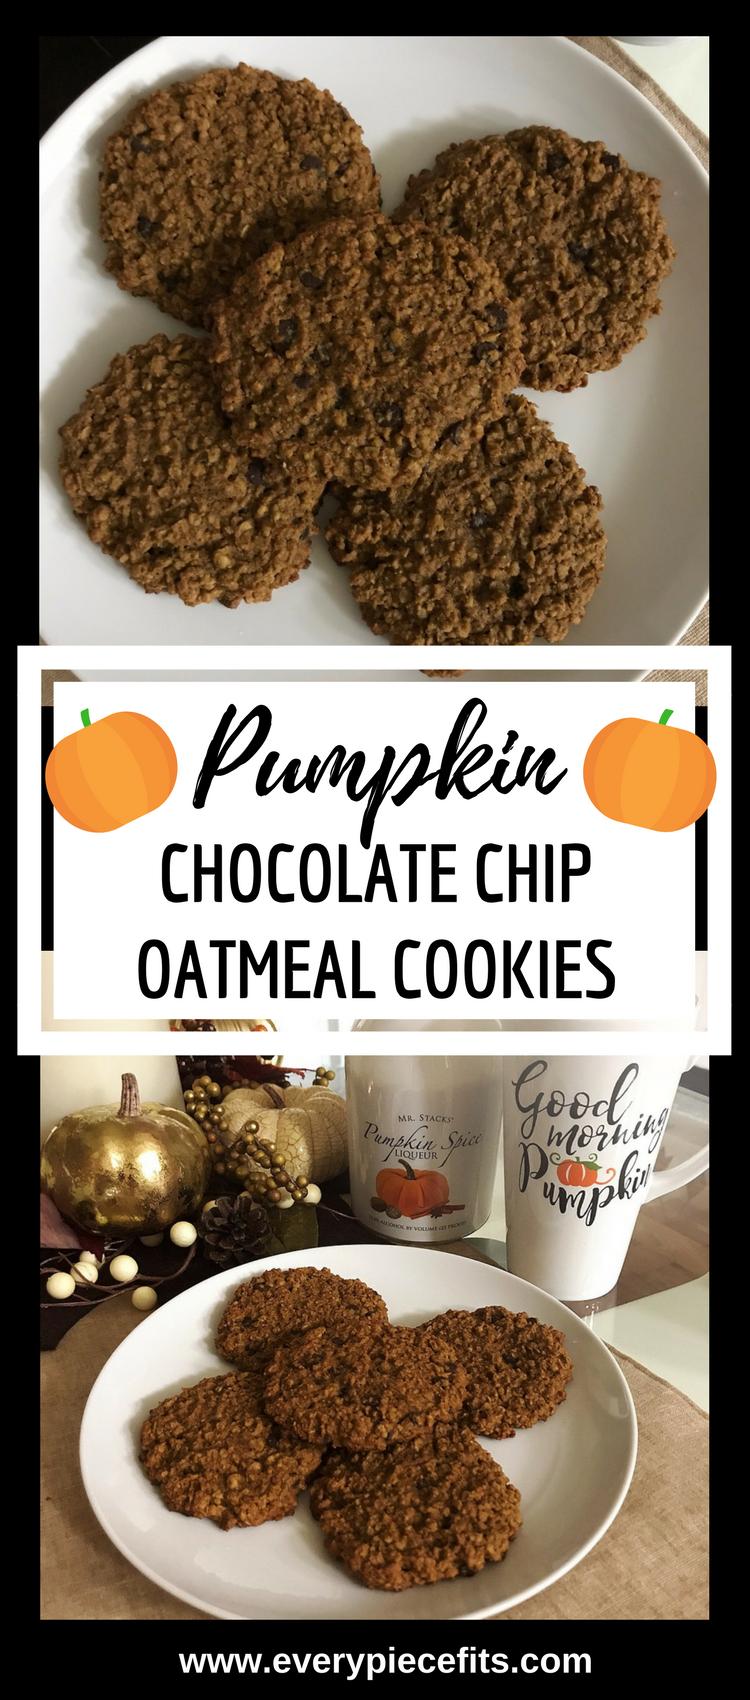 Pinterest Pumpkin Chocolate Chip Oatmeal Cookies.png